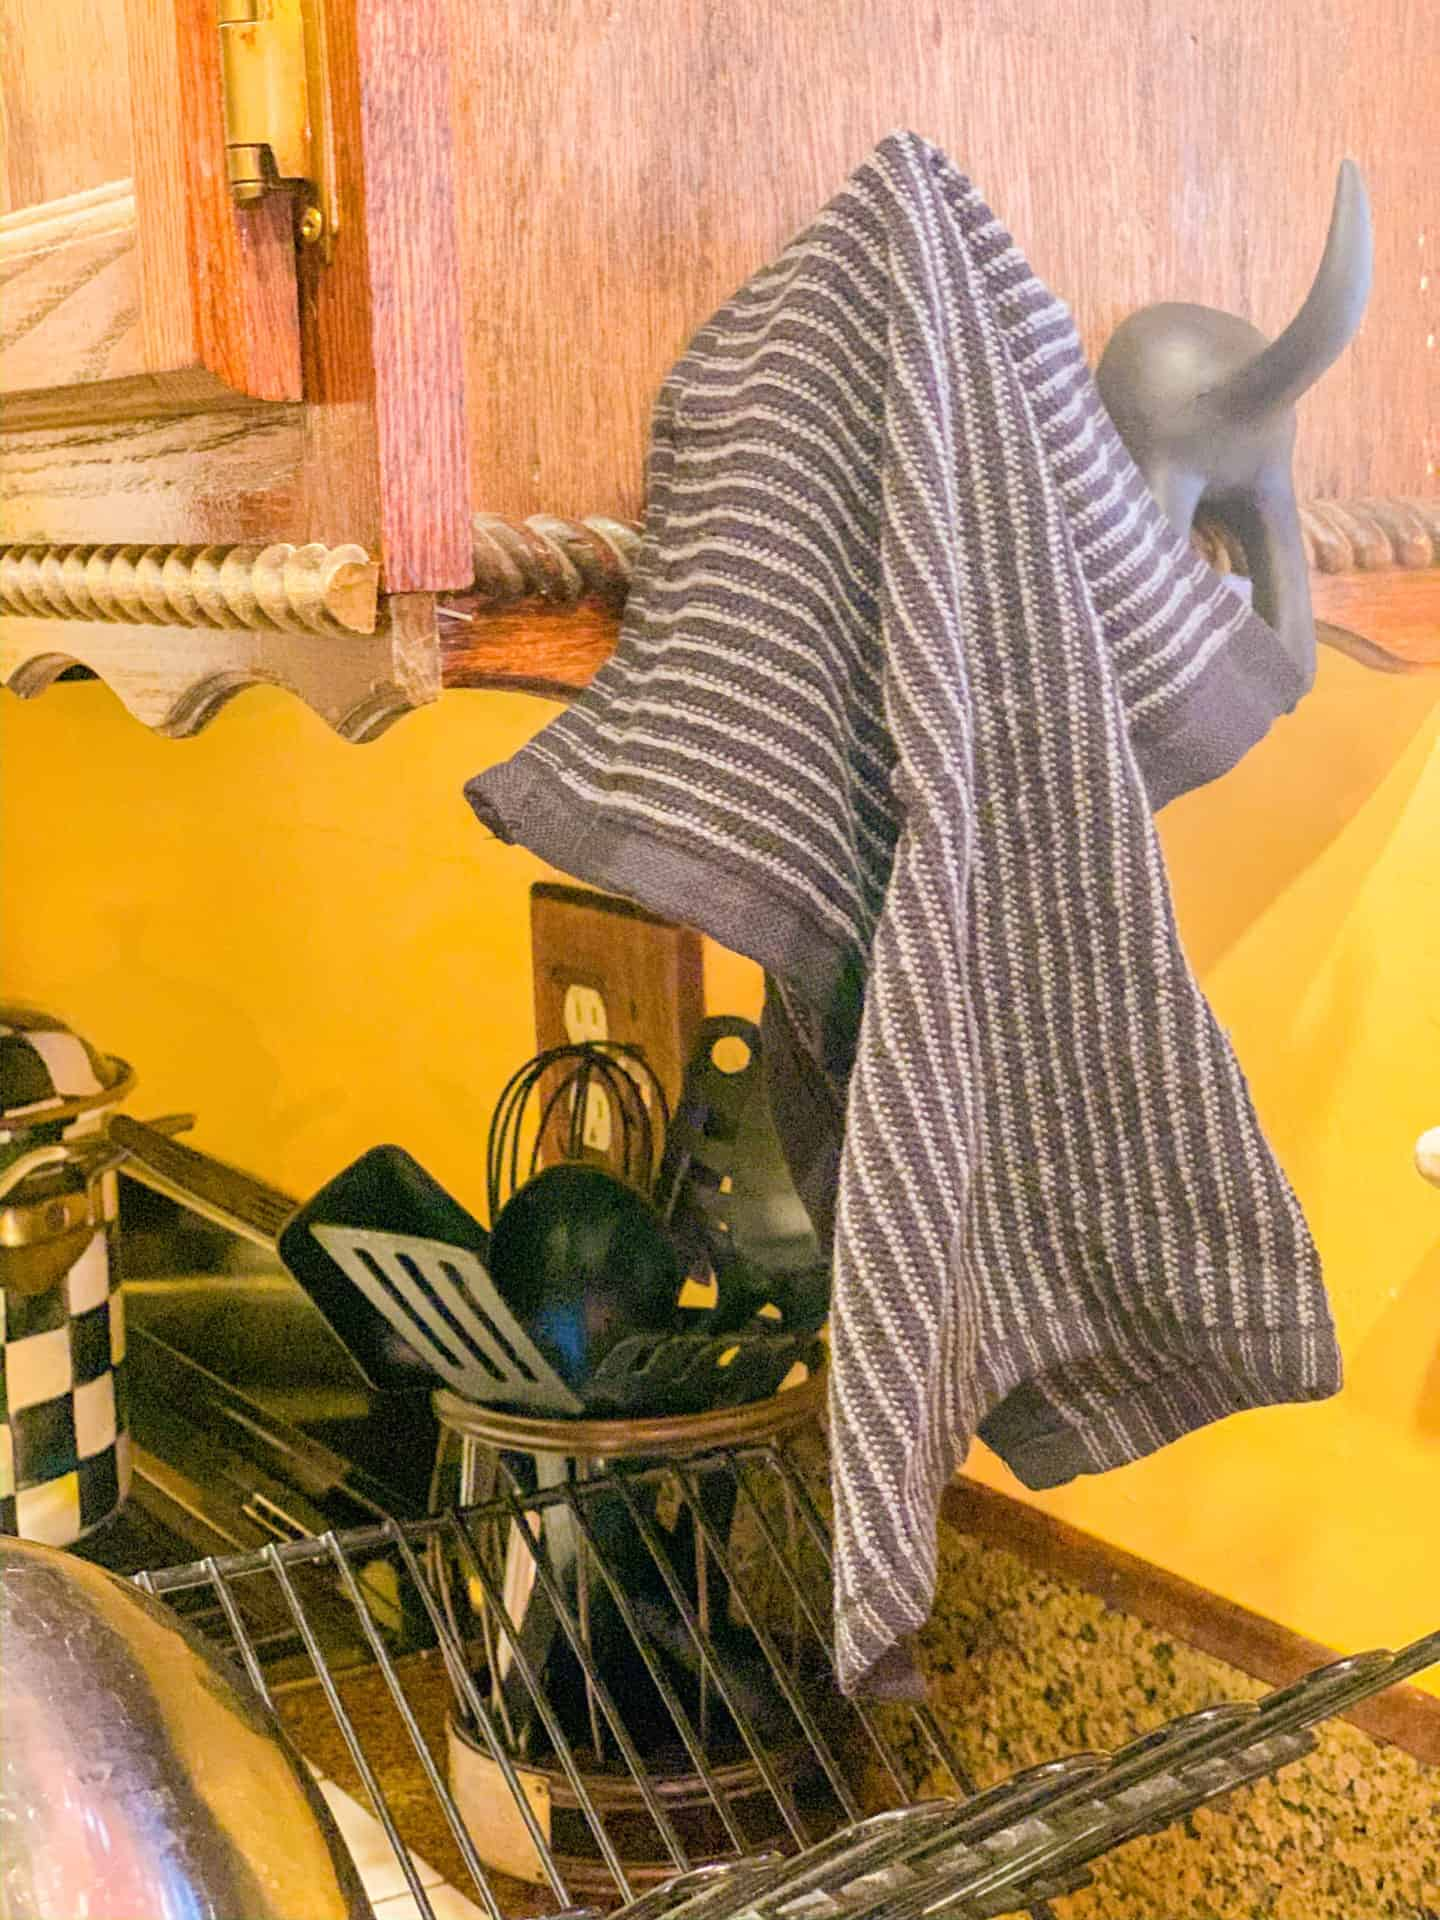 Dish Towel Holder Ideas